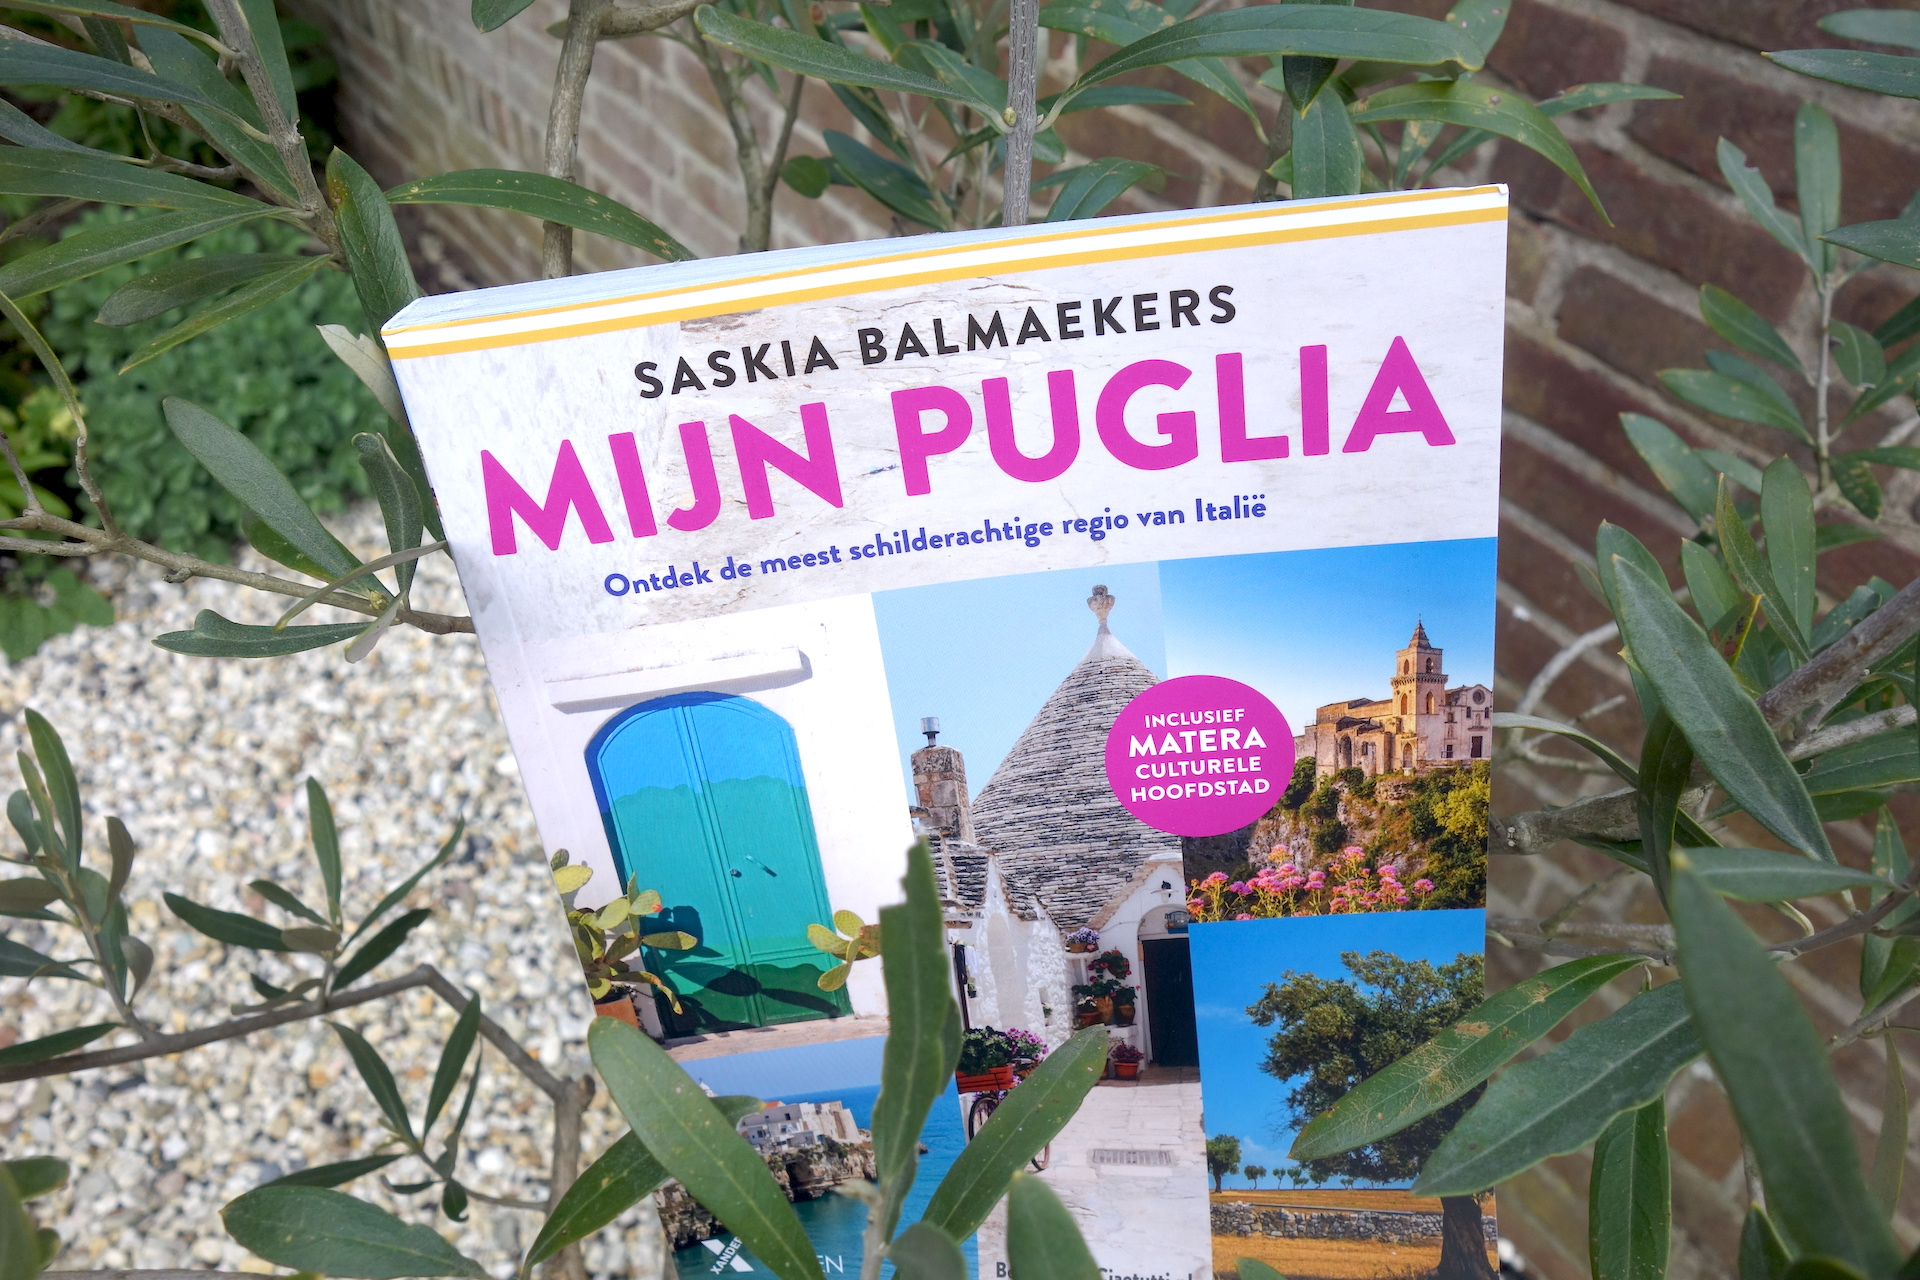 Mijn Puglia, Saskia Balmaekers van Ciao Tutti